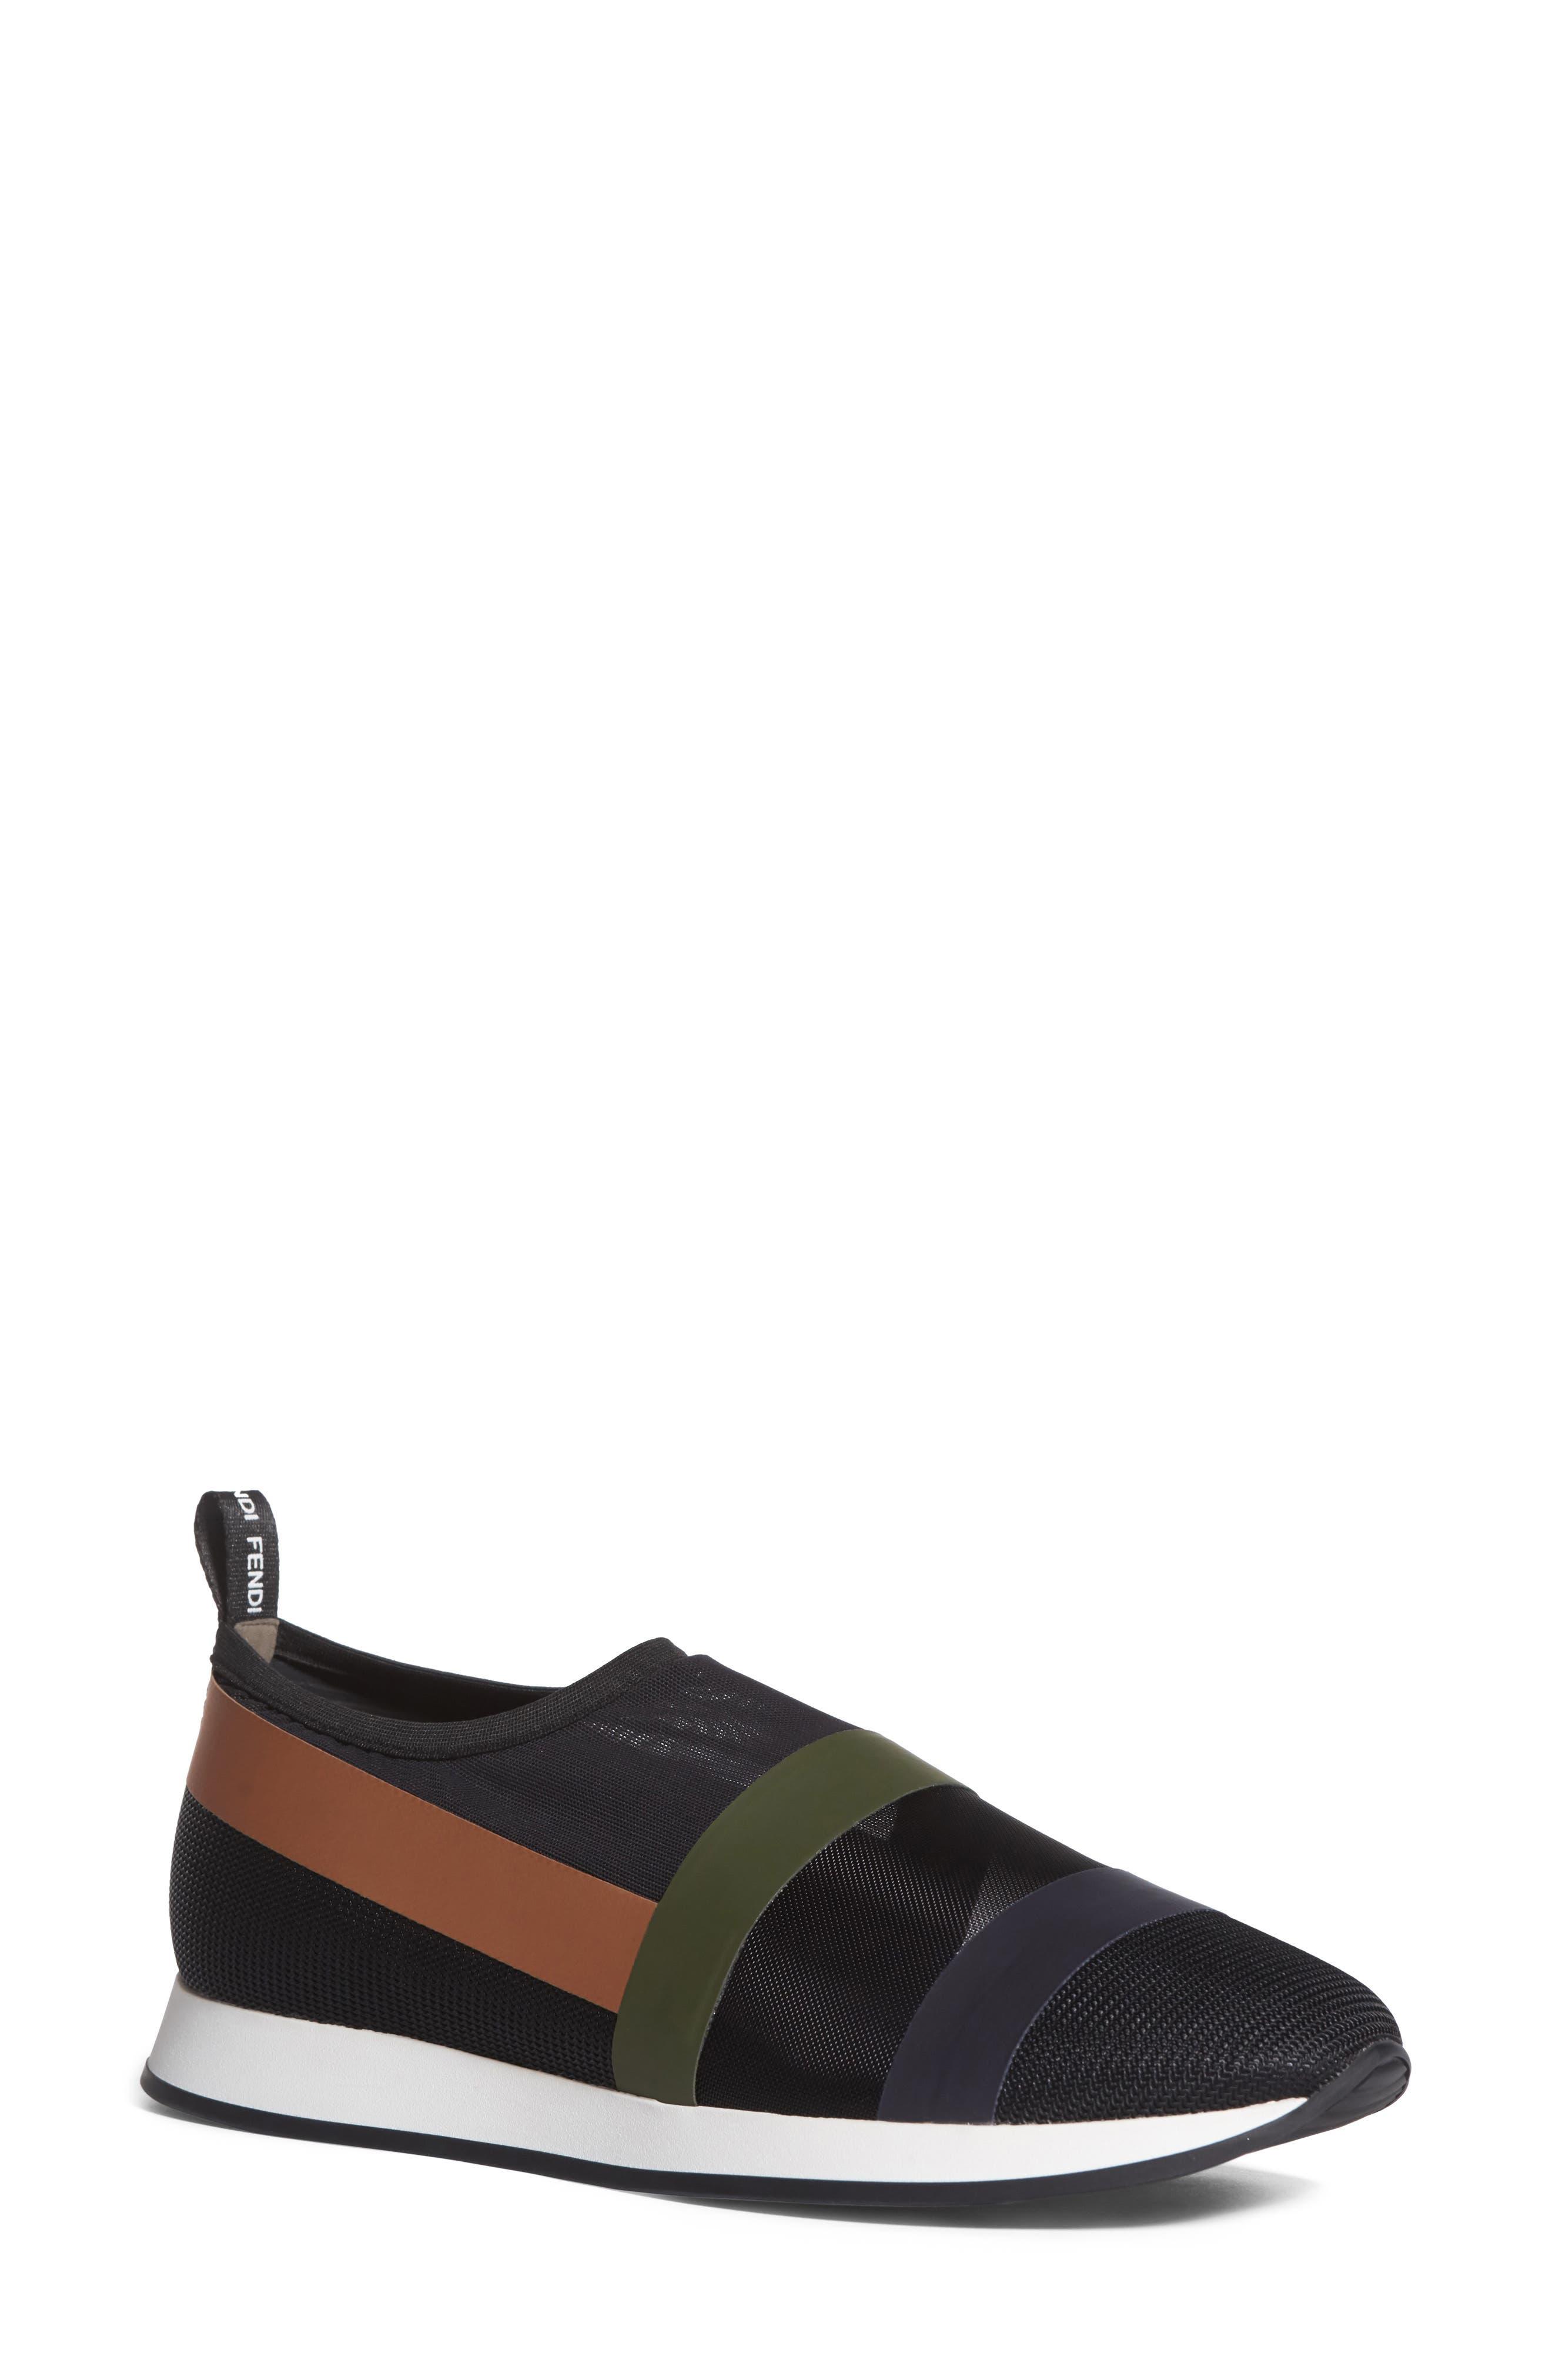 Fendi Slip-On Sneaker (Women)